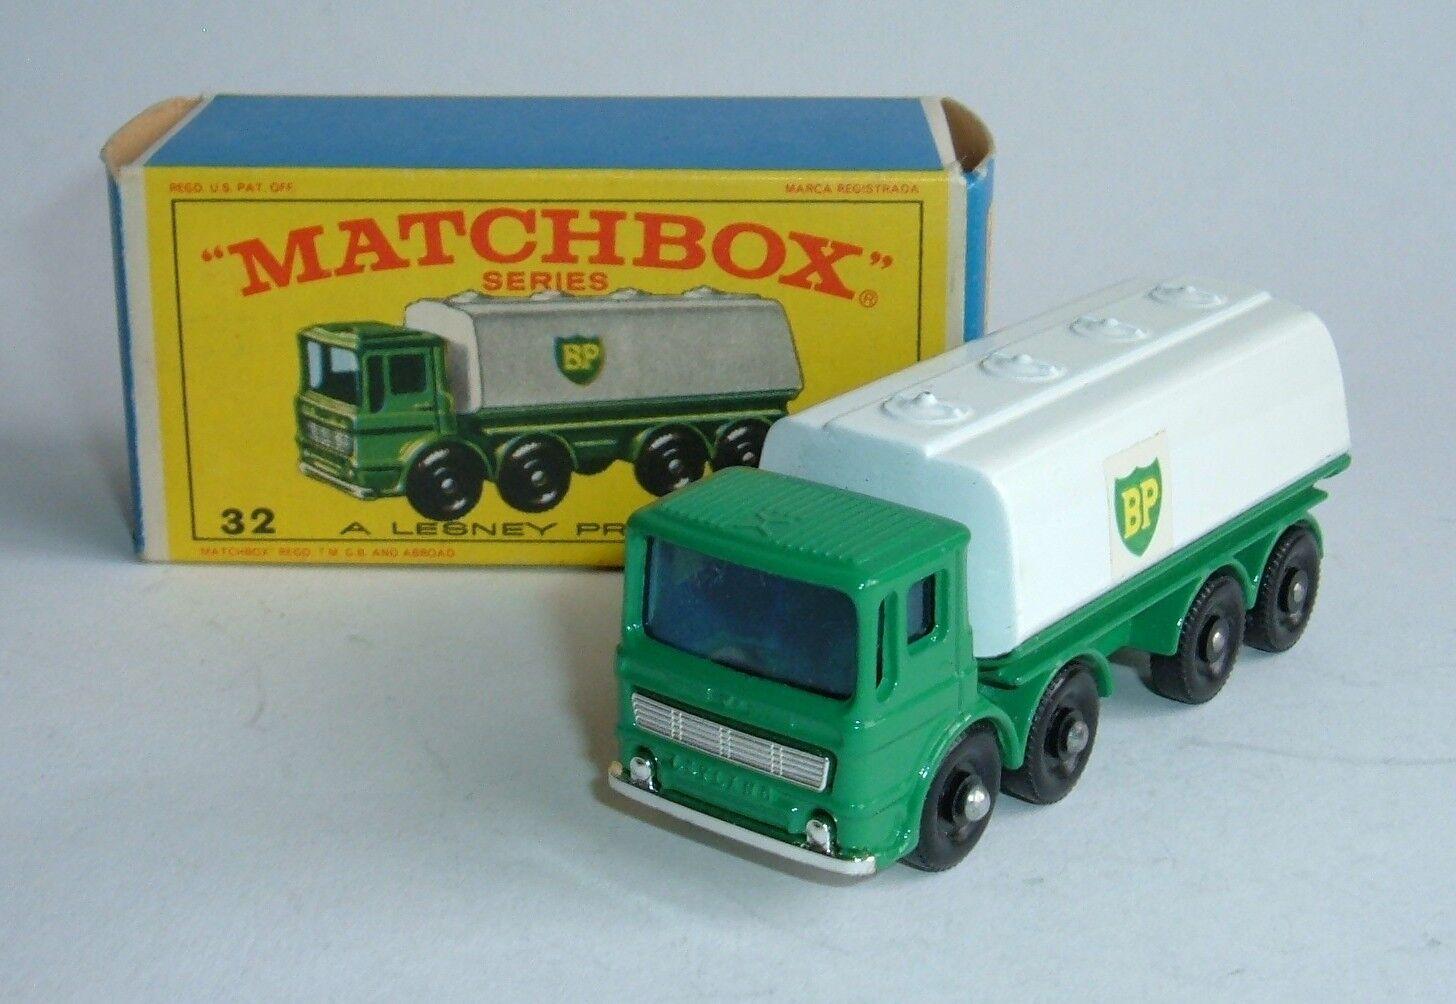 Matchbox Series No. 32, Leyland Petrol Tanker, - Superb Mint.